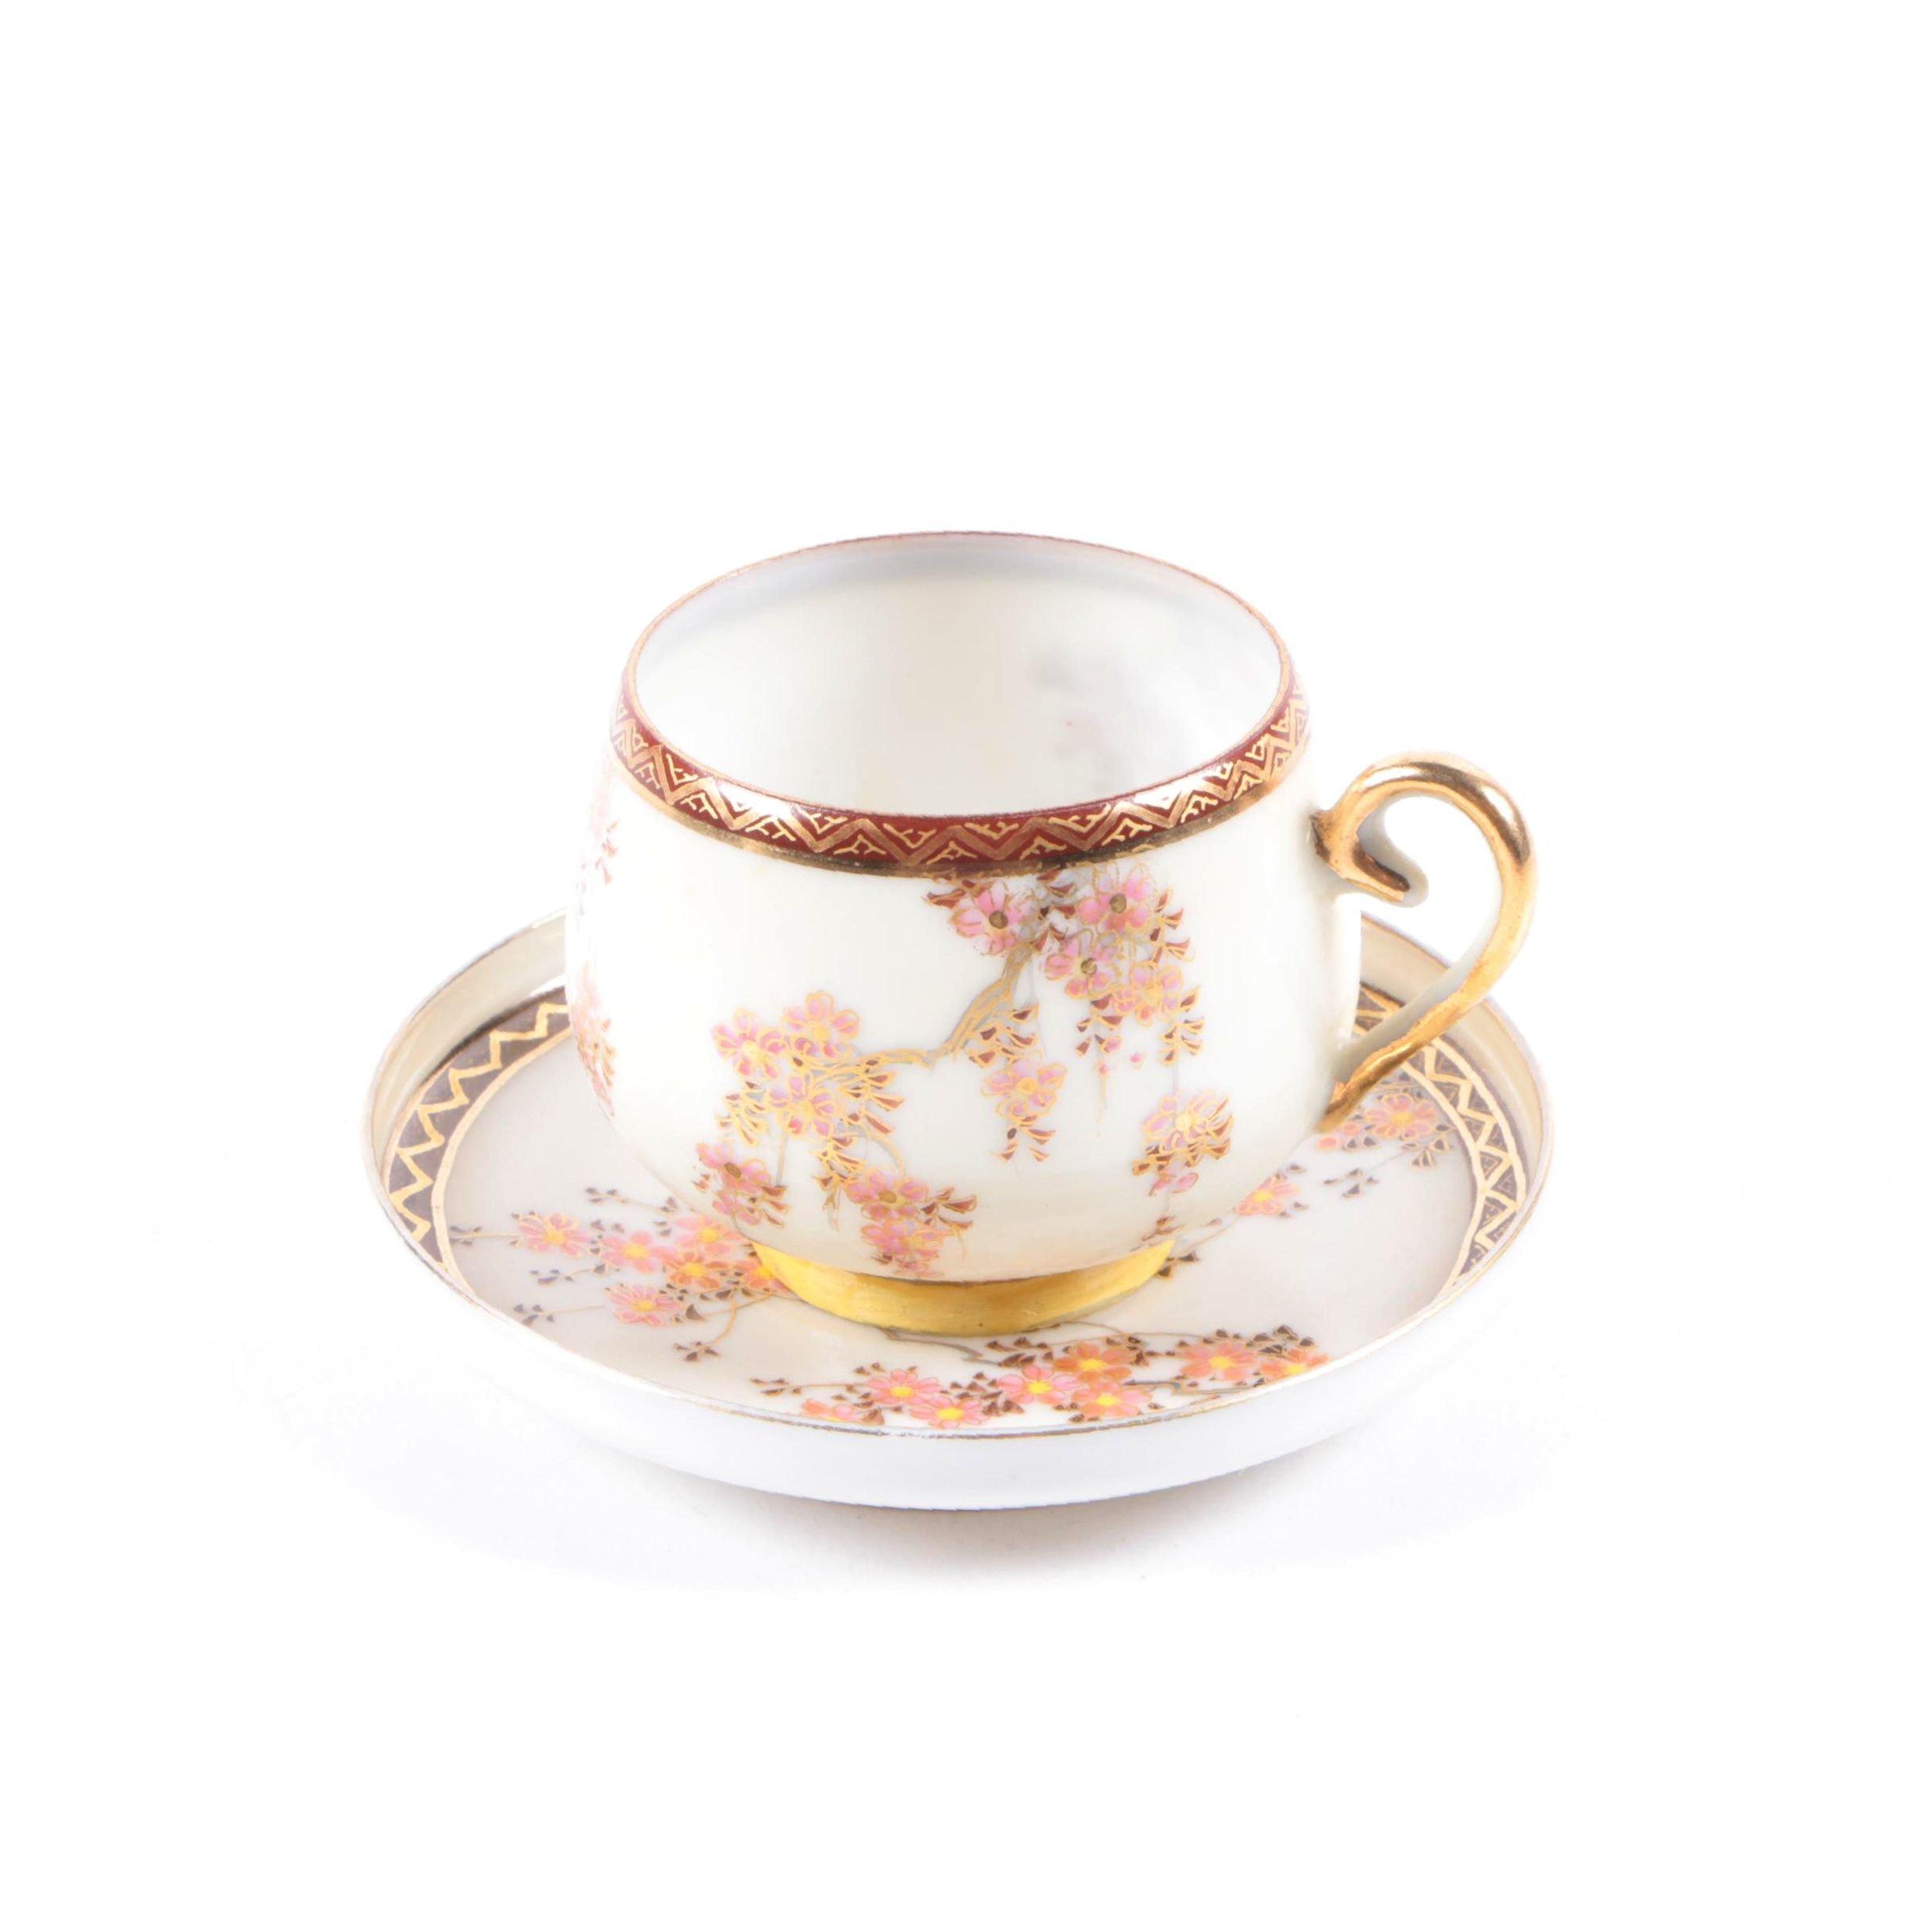 Antique Japanese Porcelain Teacup and Saucer